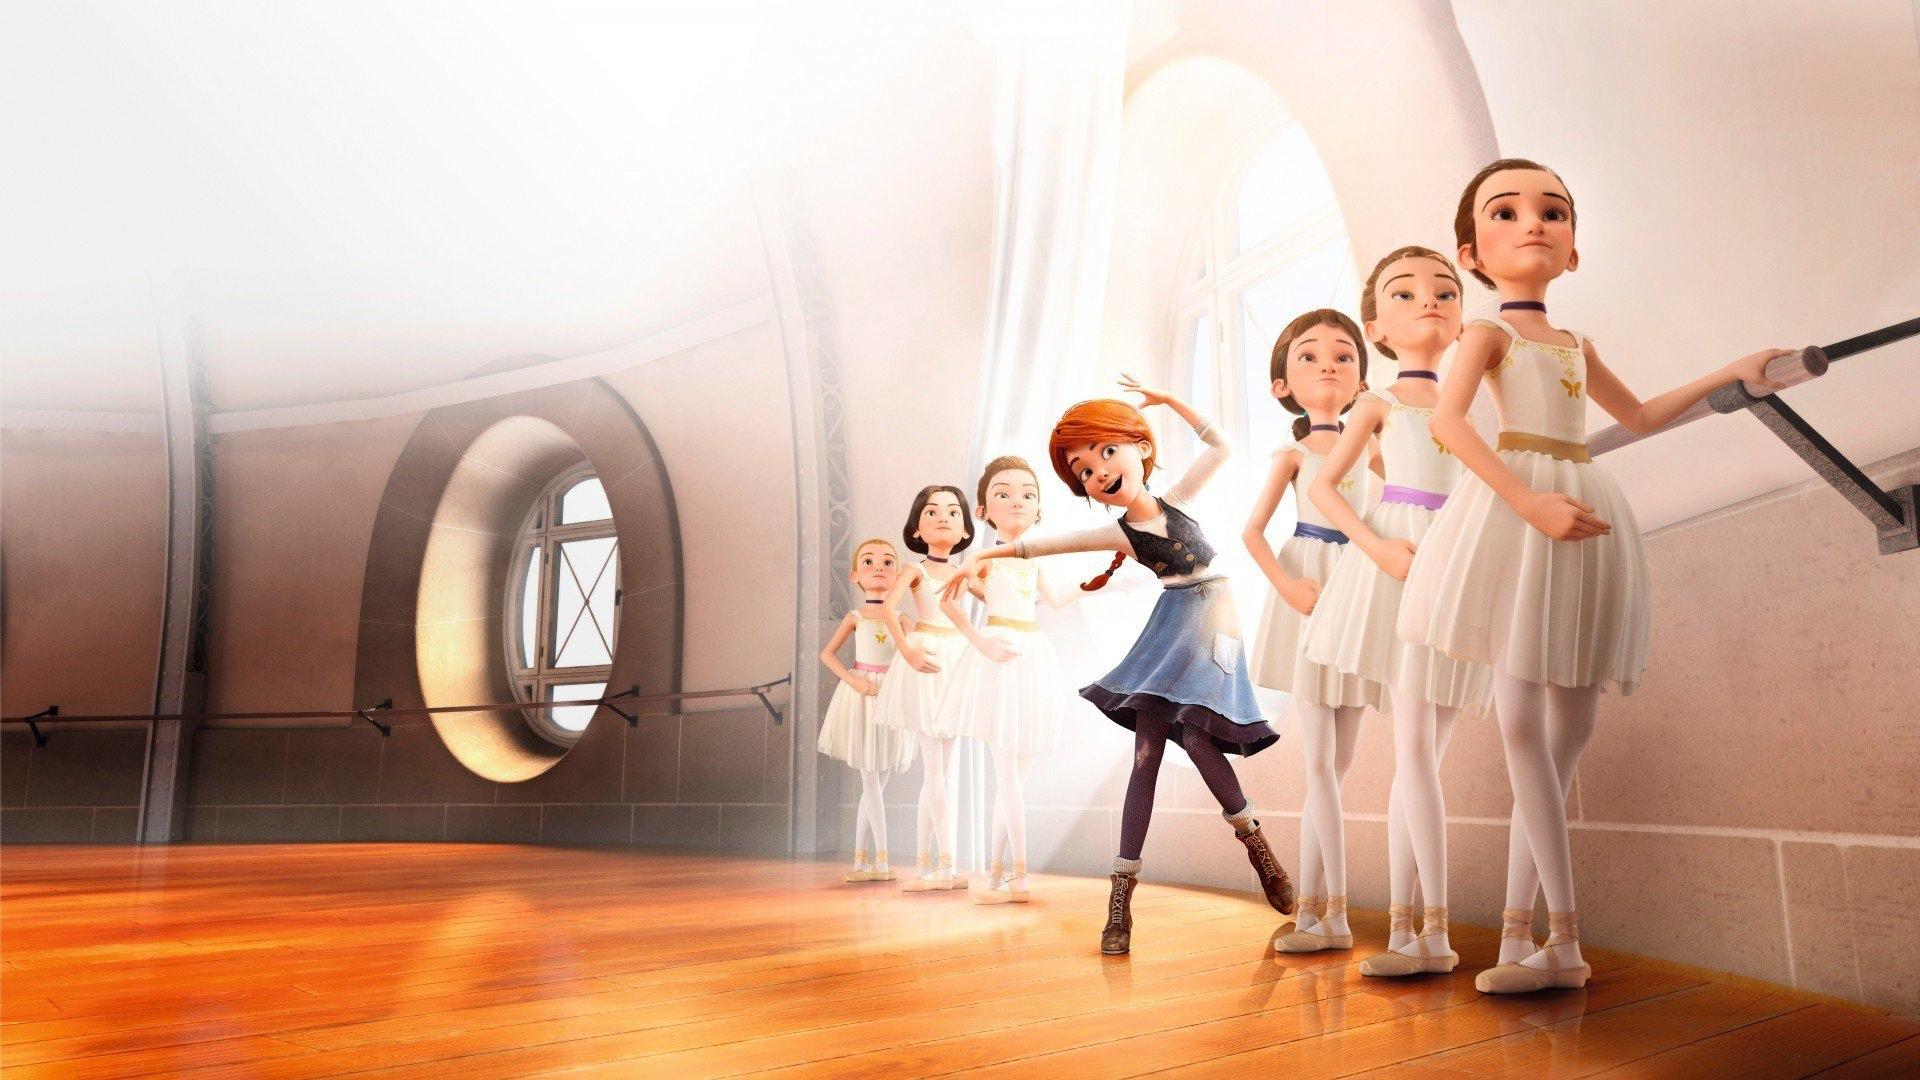 Leap! (aka Ballerina) Soundtrack